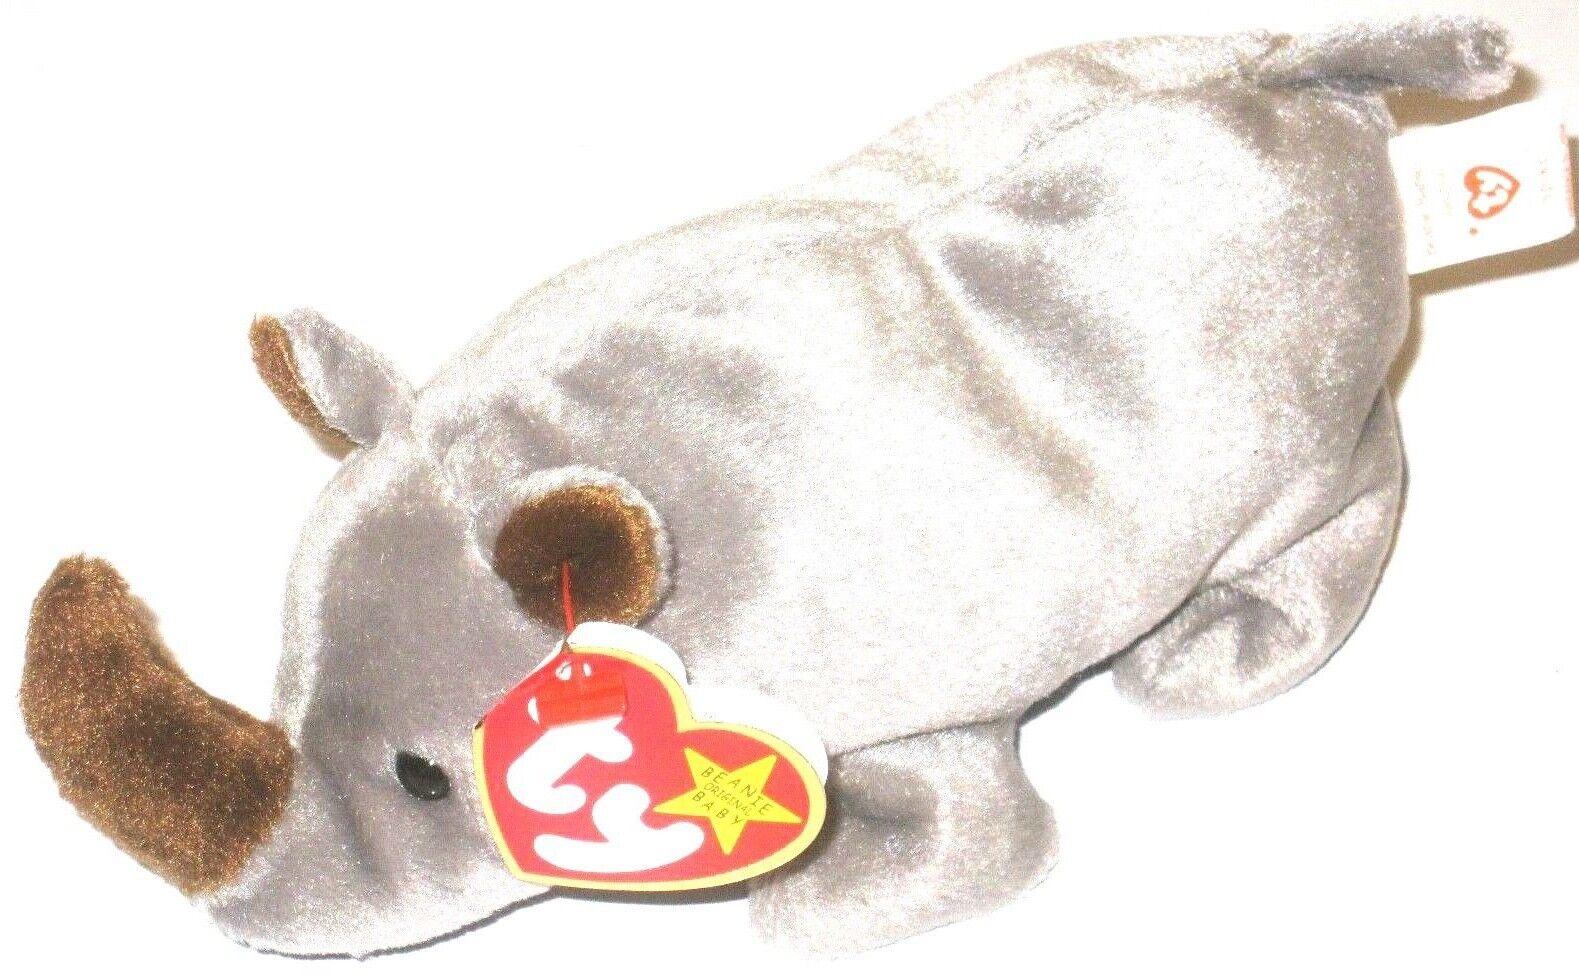 bfff16764e9 Ty Beanie Baby Spike Rhinoceros P E Pellets Retired Rare 1996 ...